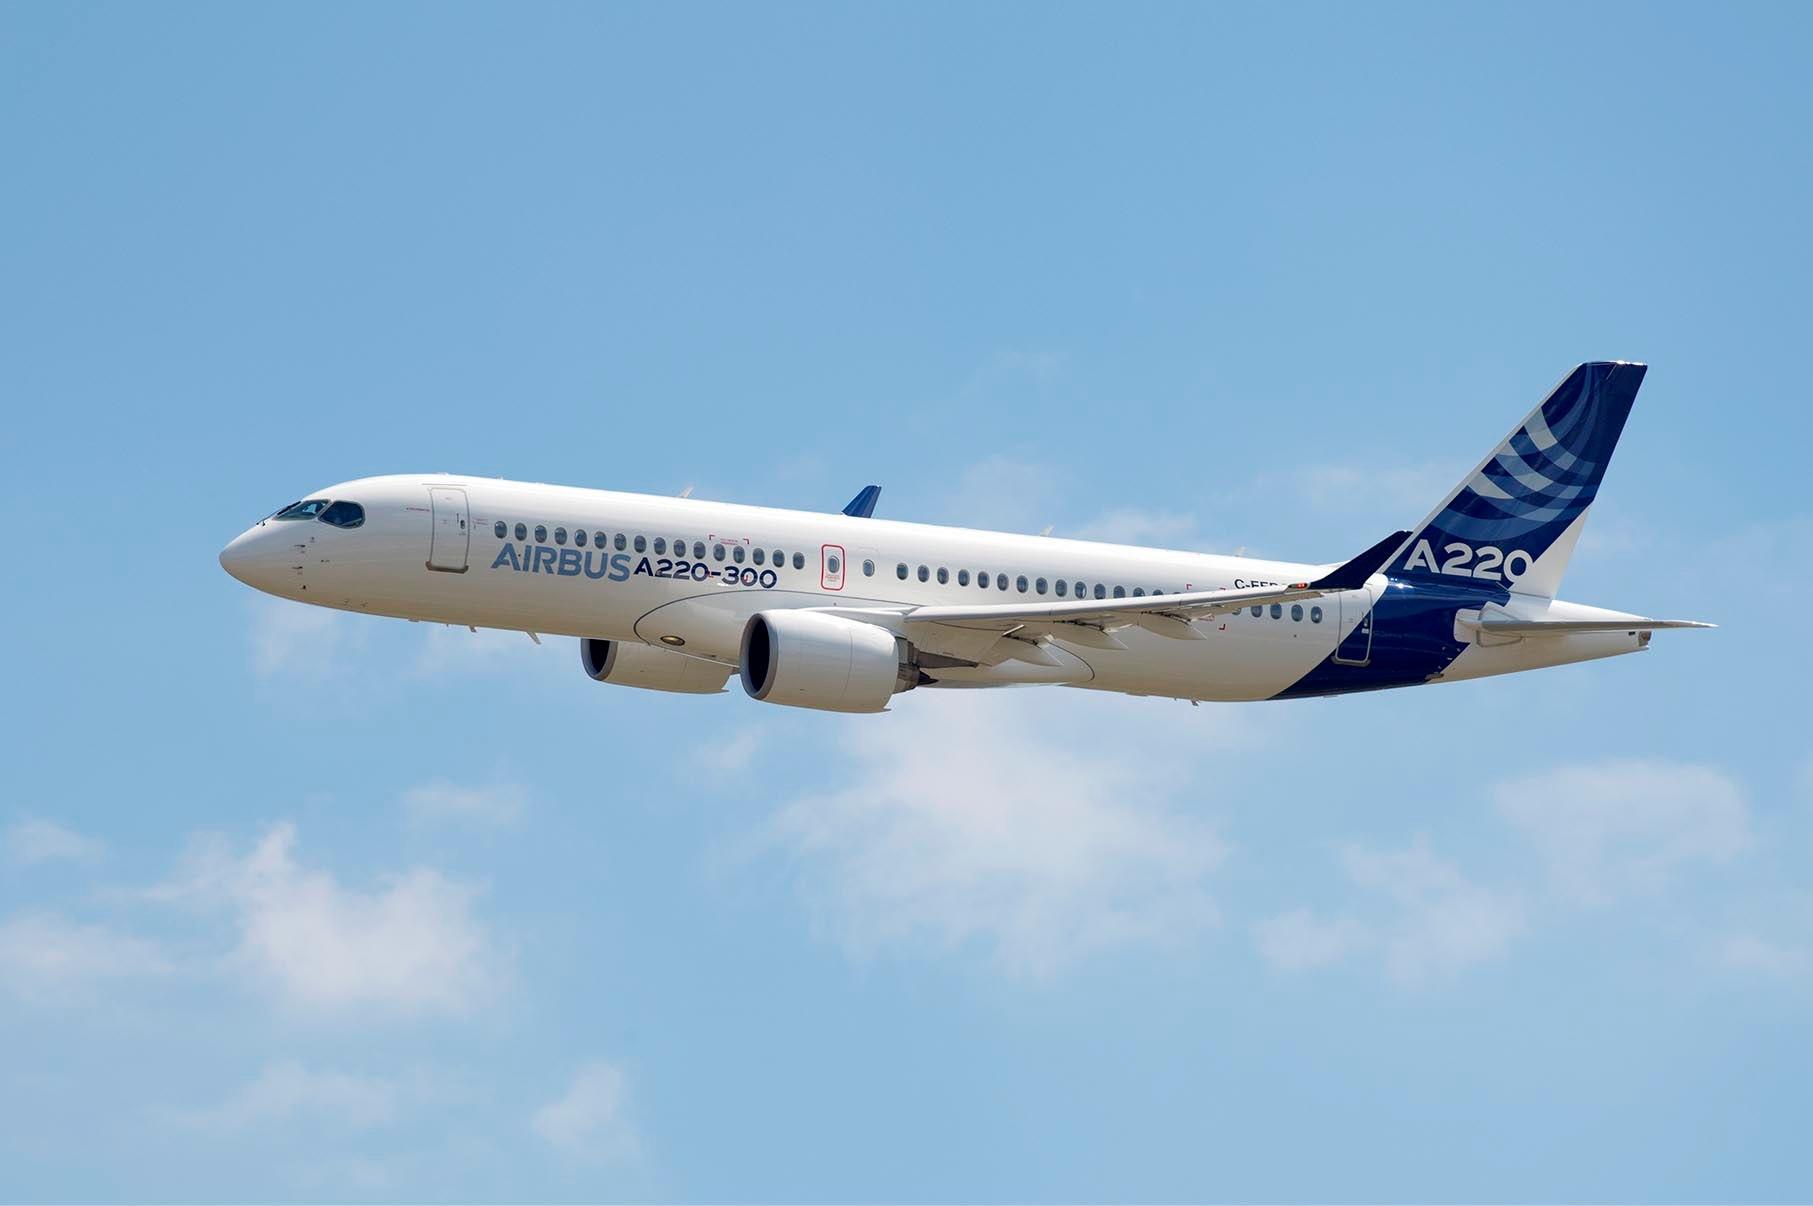 Airbus A220-300. (Foto: F. LANCELOT | master films)